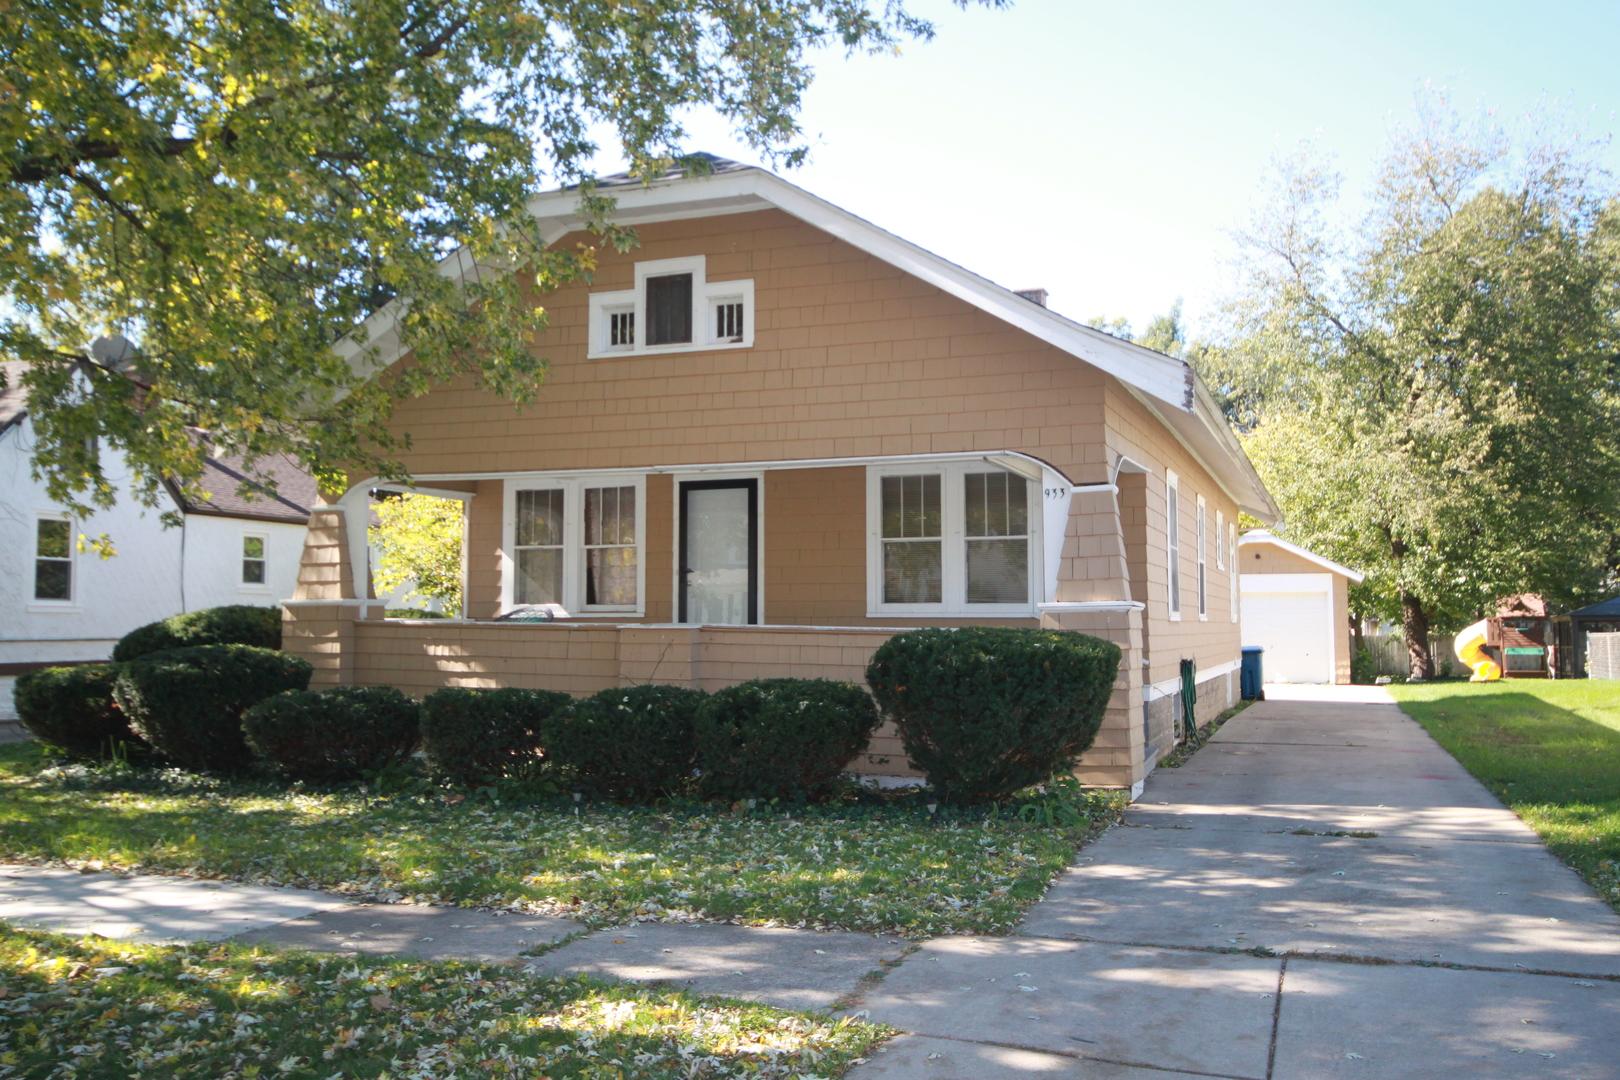 933 Pearl ,Aurora, Illinois 60505